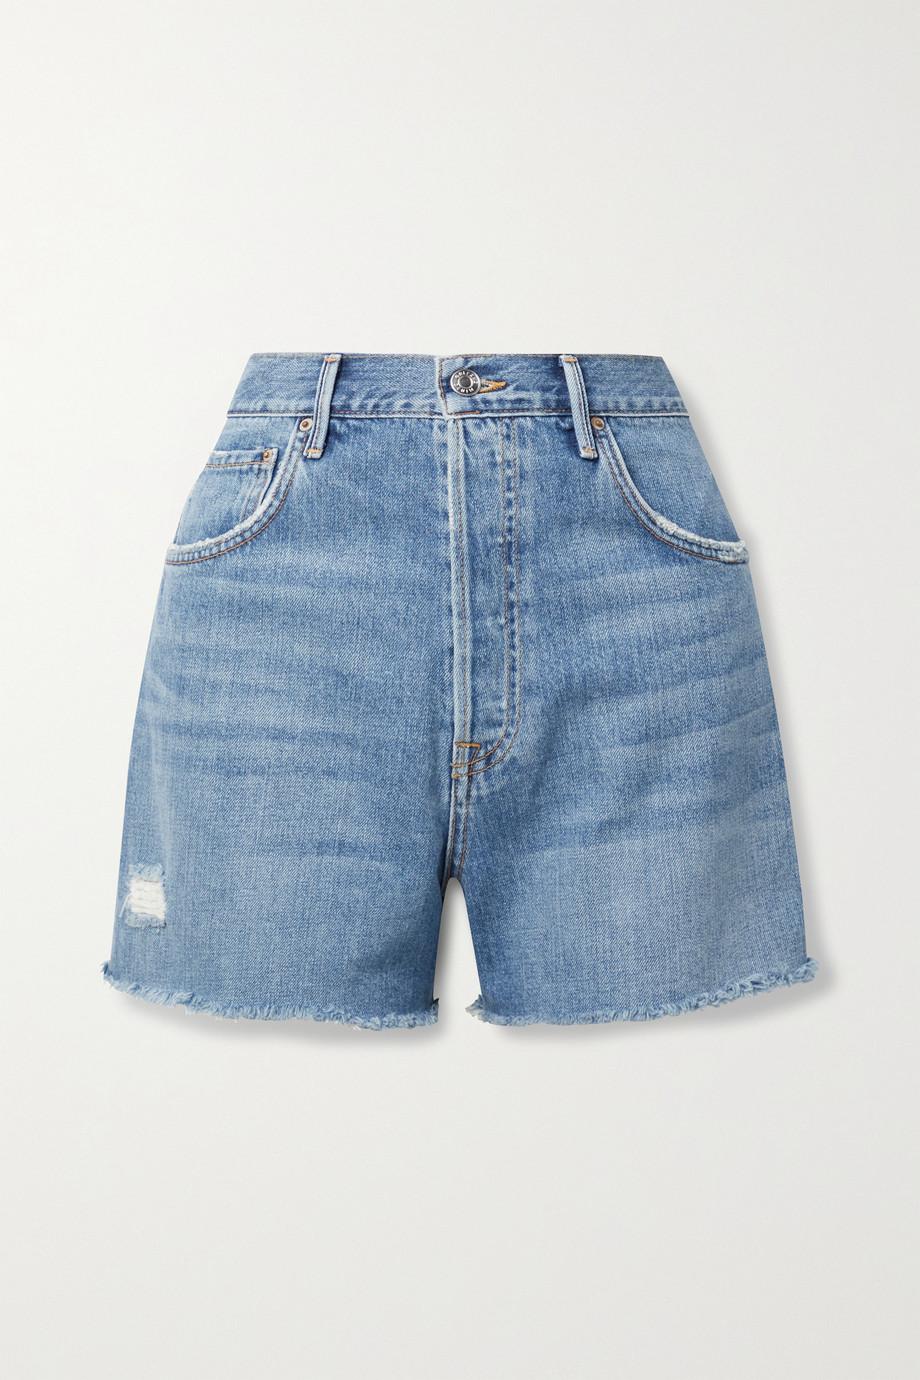 GRLFRND Jules frayed denim shorts